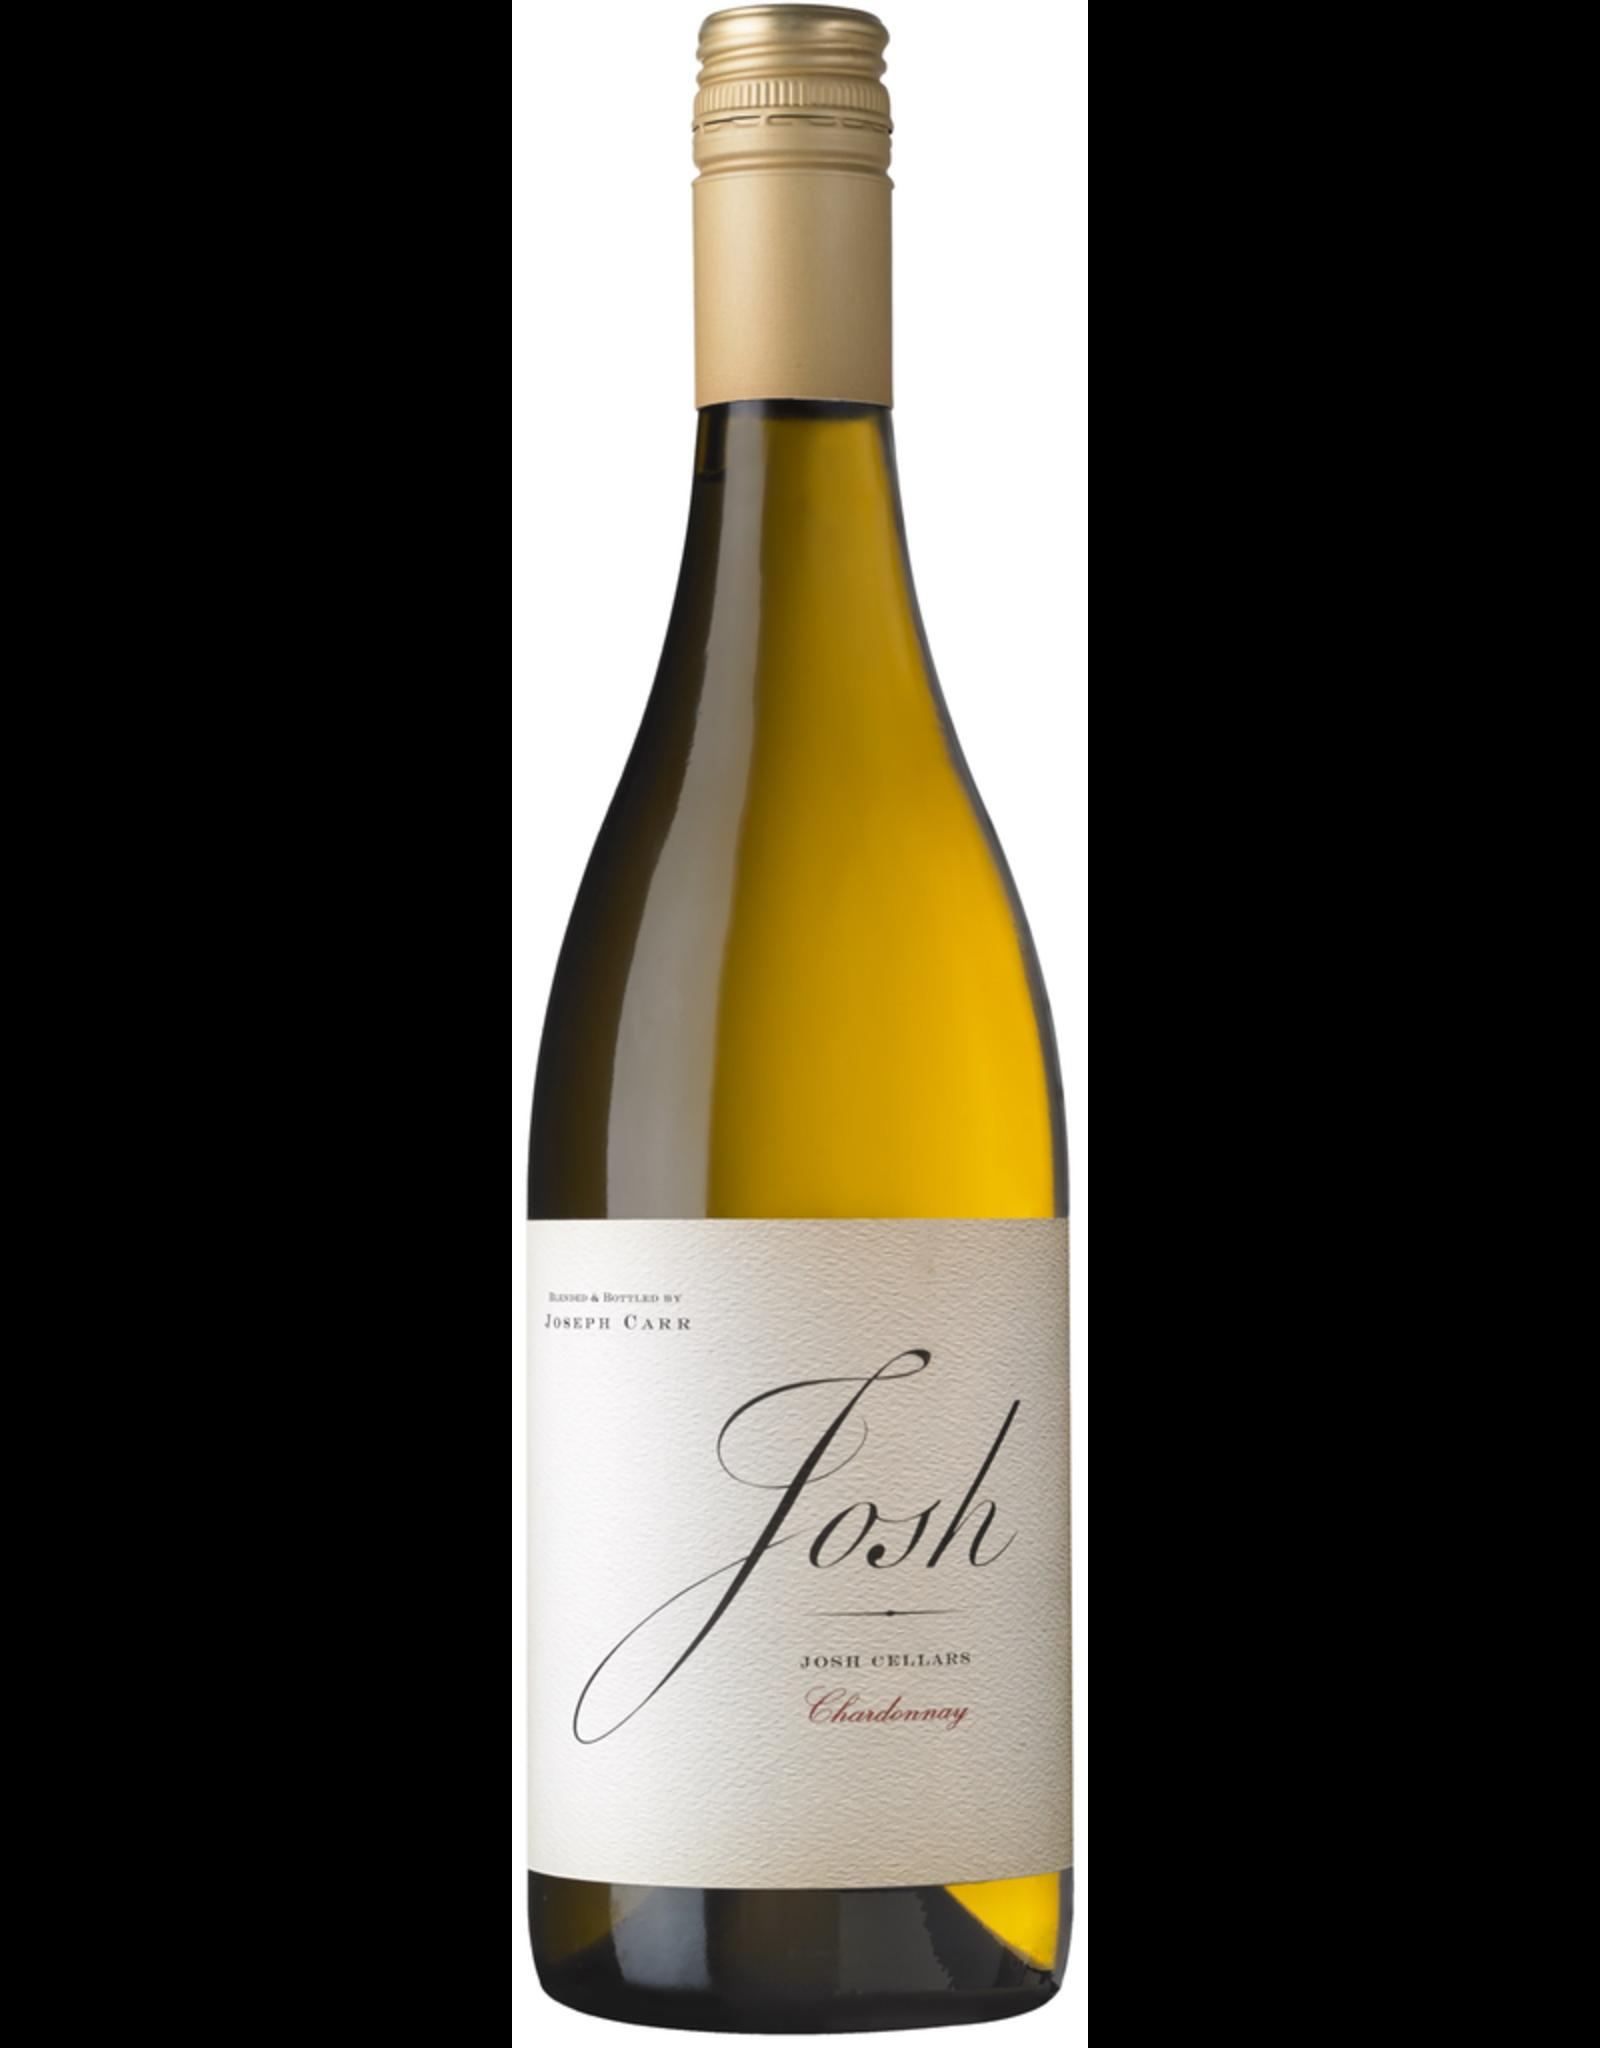 White Wine 2018, Josh Cellars, Chardonnay, Multi AVA, North Coast, California,14% Alc, CT87, TW87